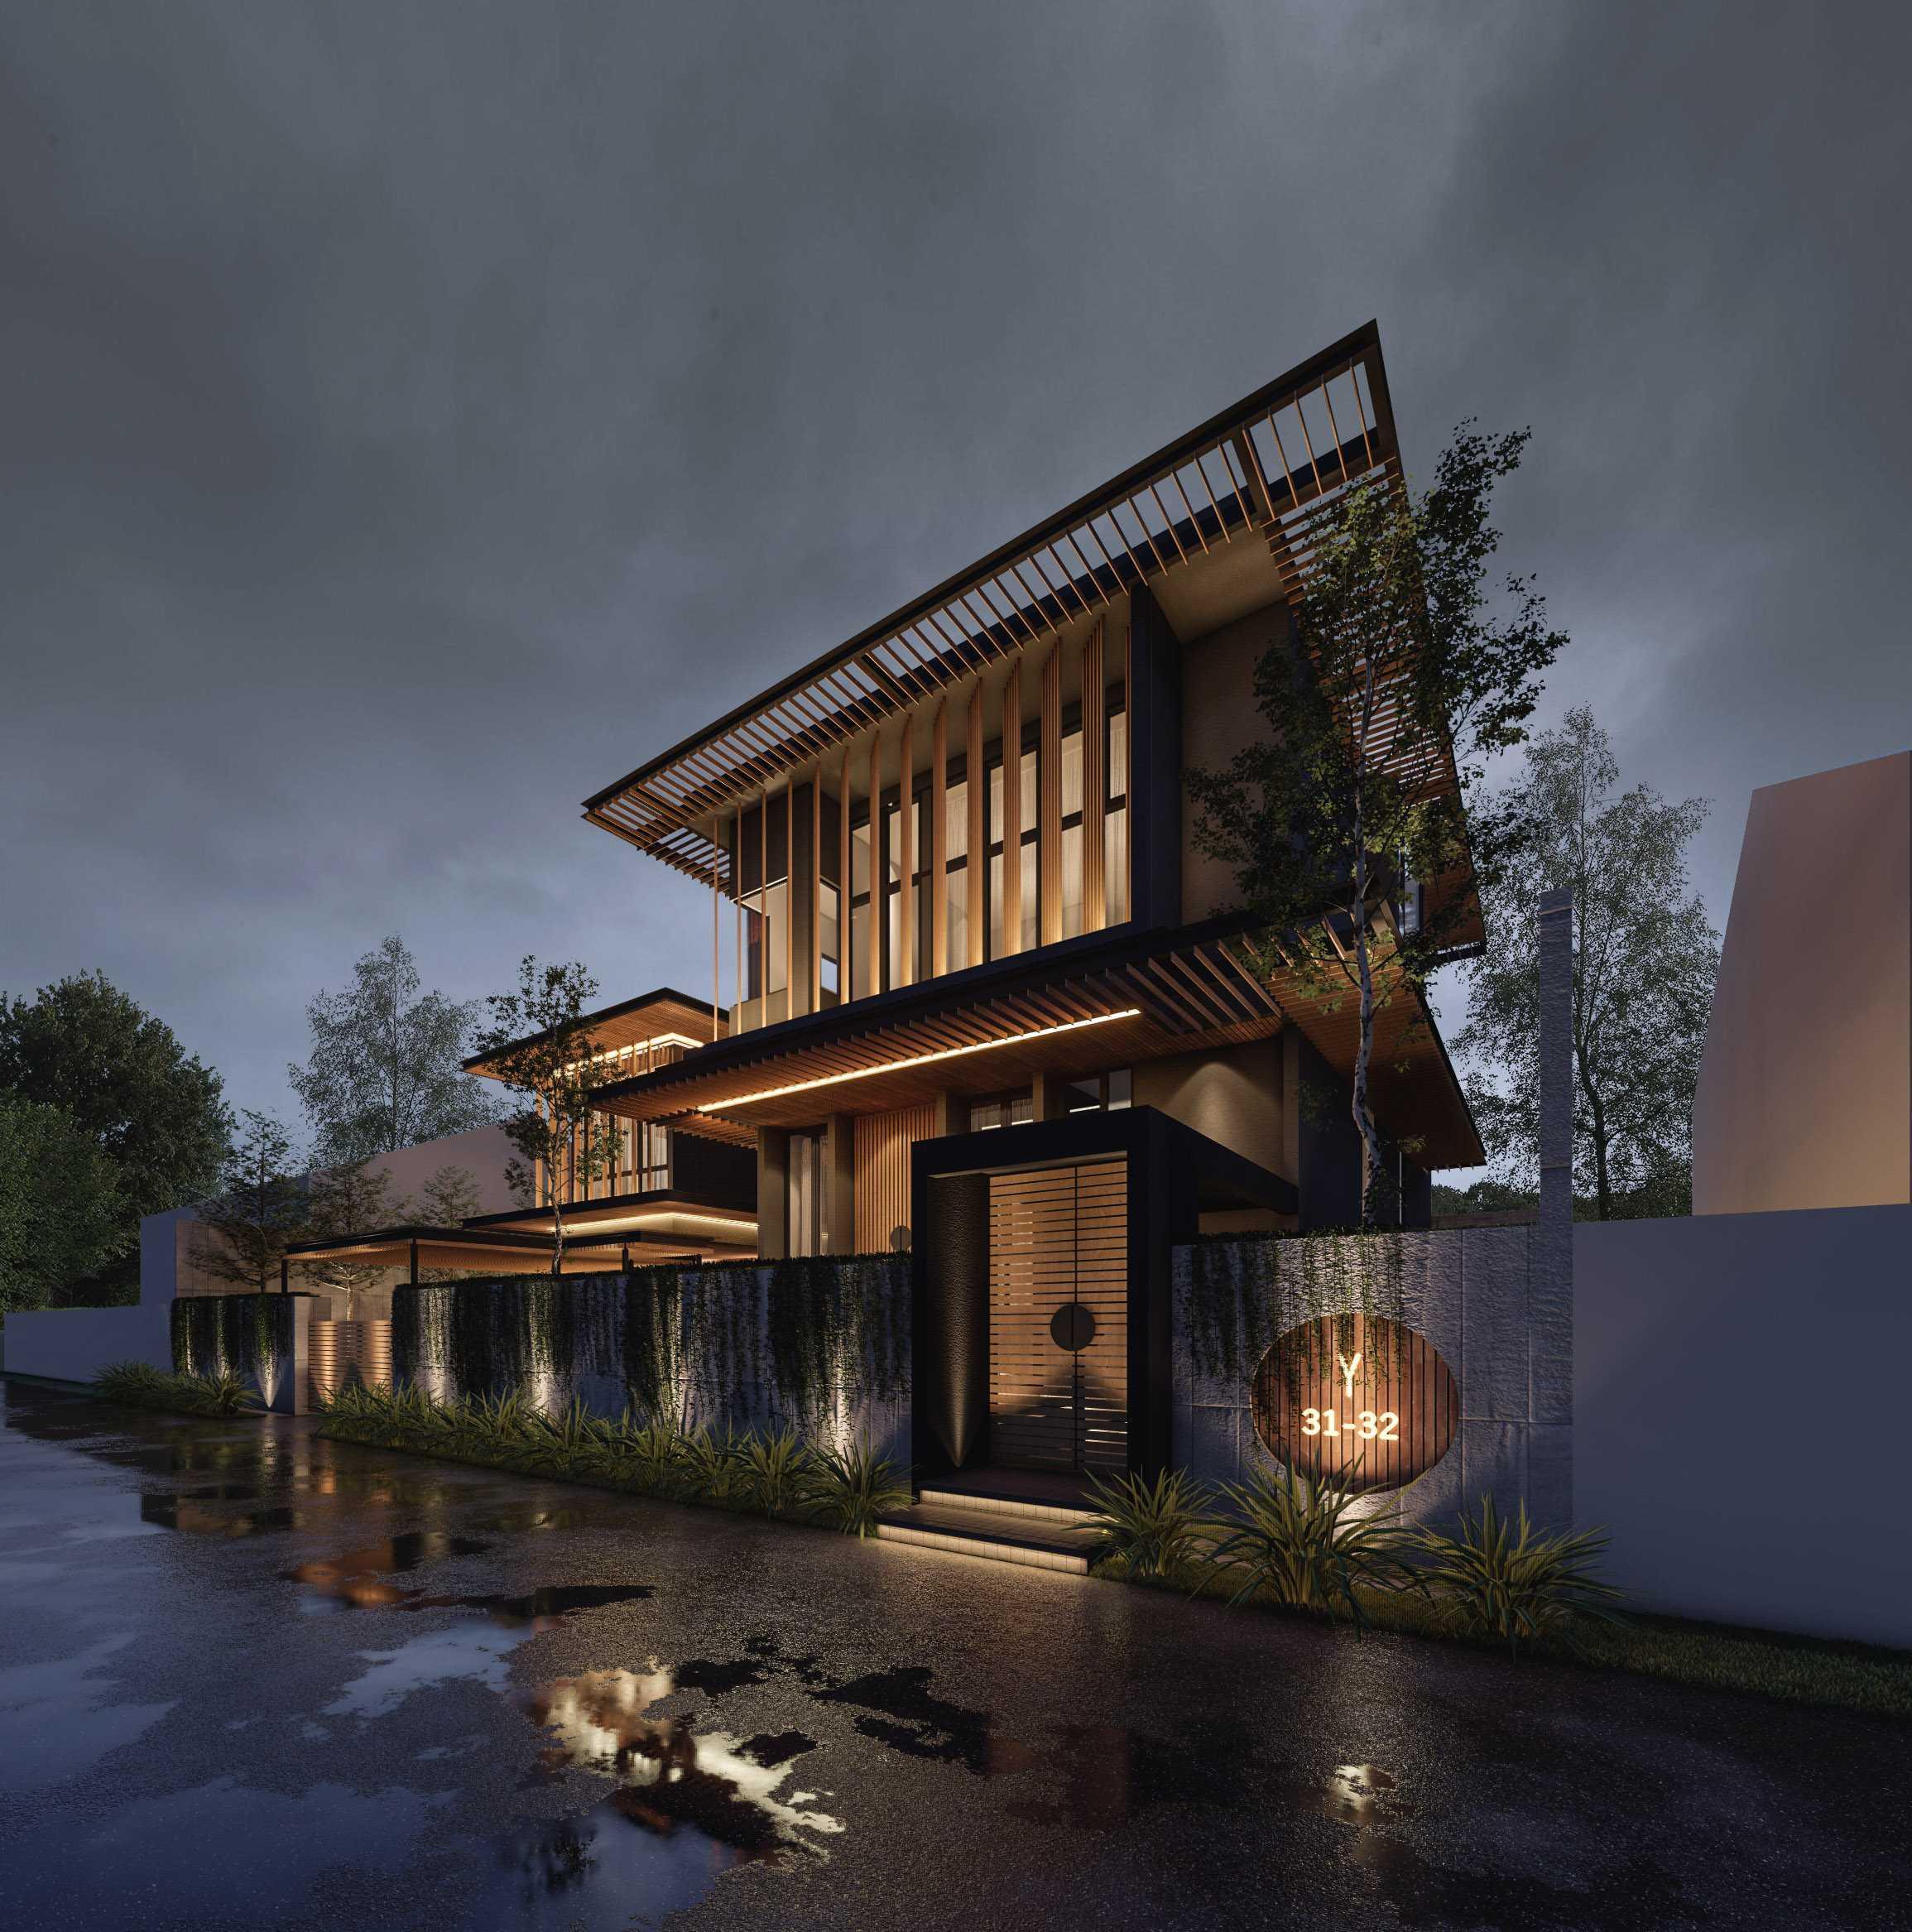 Mahastudio & Partner Y House Palembang, Kota Palembang, Sumatera Selatan, Indonesia Palembang, Kota Palembang, Sumatera Selatan, Indonesia Mahastudio-Partner-Y-House   97226